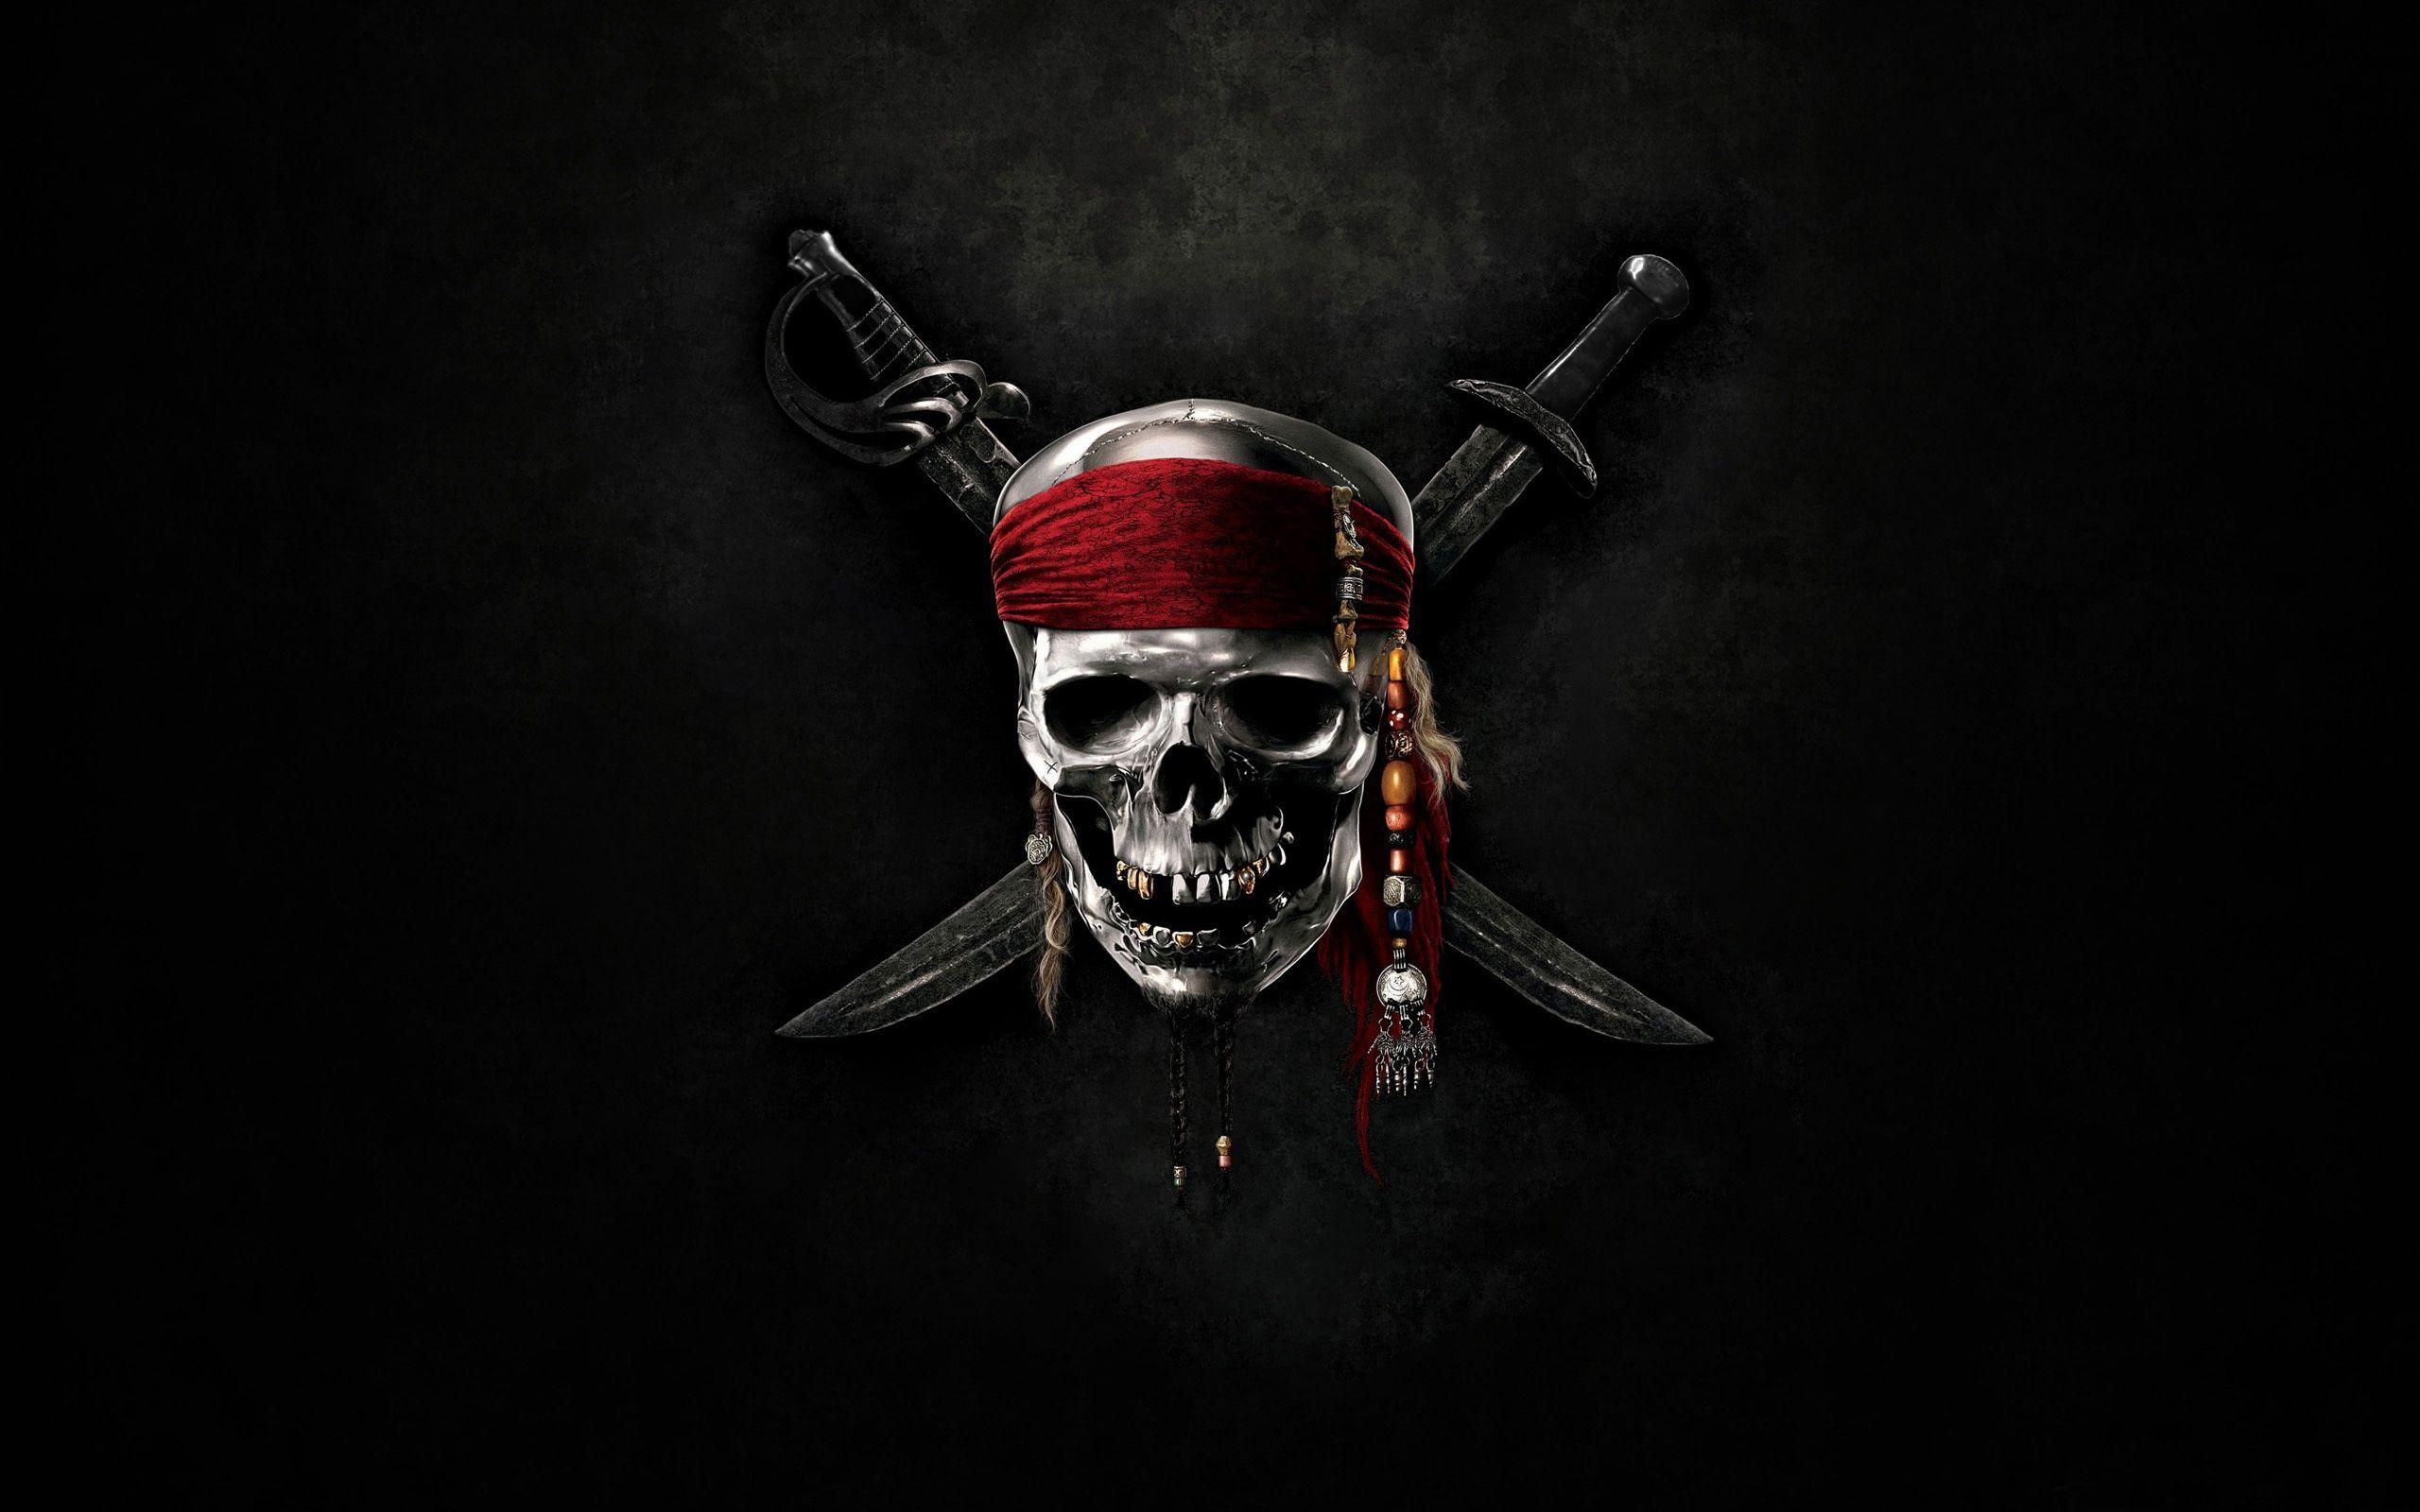 Pirate Wallpaper 10 Jpg 2560 1600 Skull Wallpaper Pirates Of The Caribbean Hd Skull Wallpapers